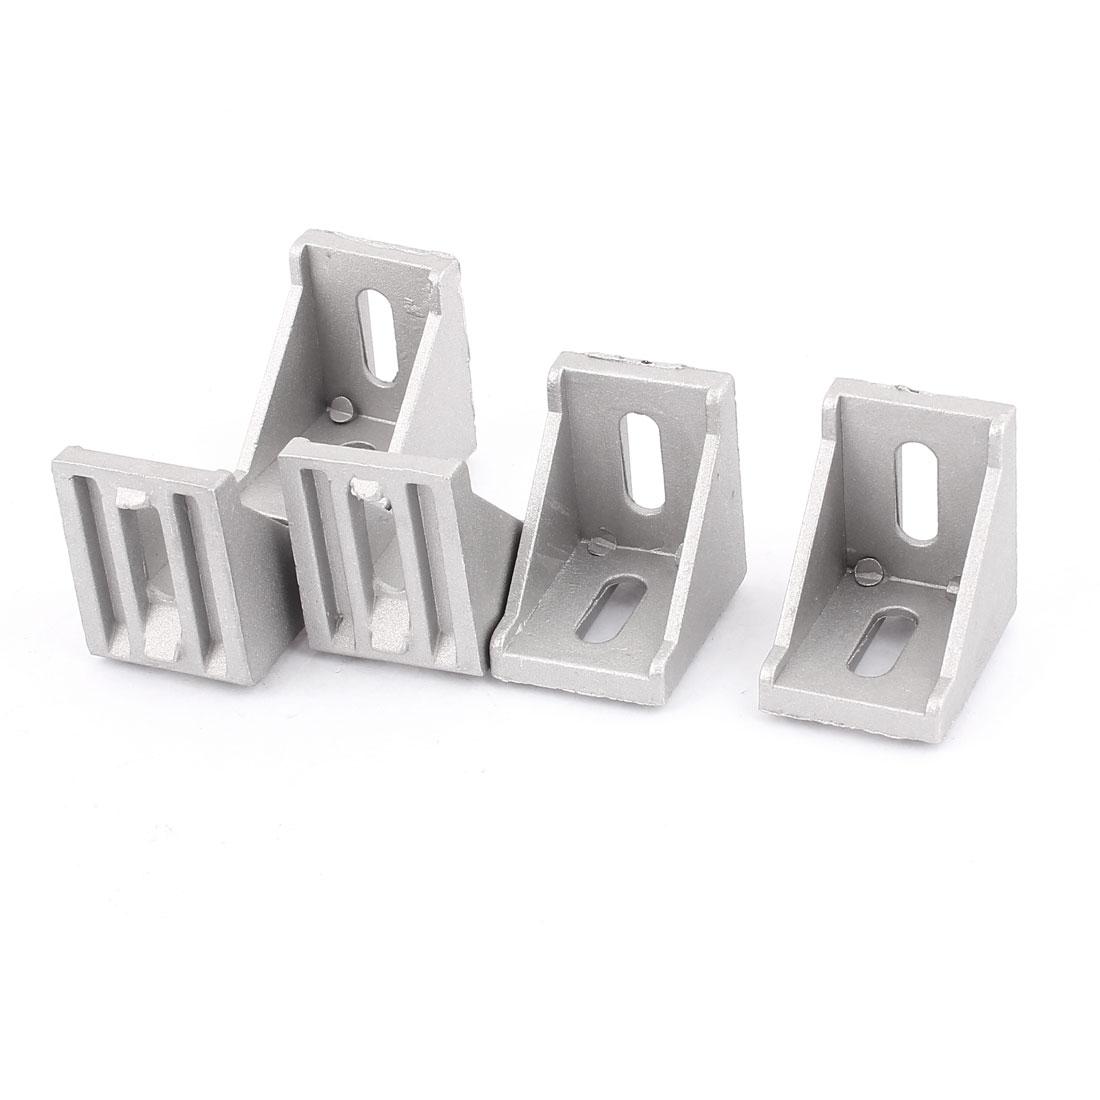 Aluminum Alloy 35x35x28mm Corner Brace Angle Bracket Support 5Pcs